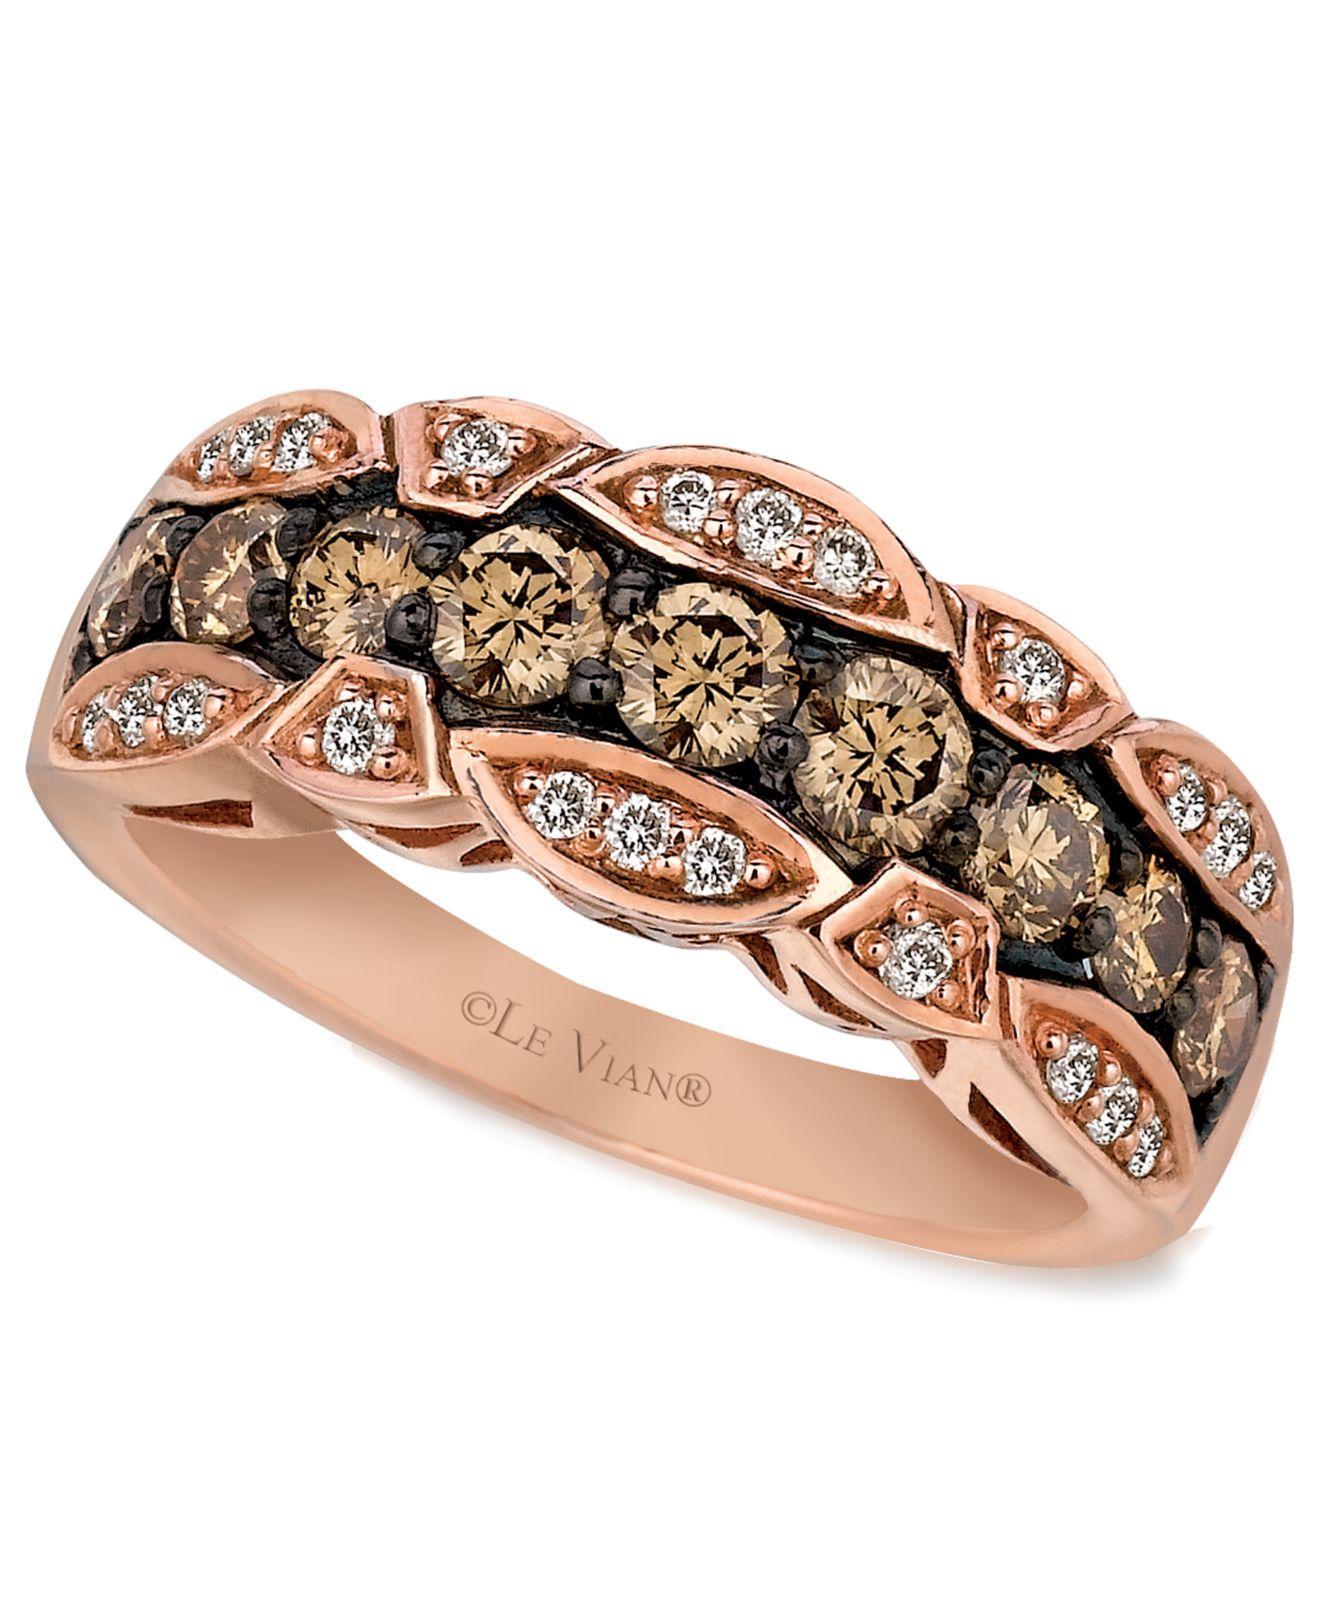 le vian 14k rose gold chocolate and white diamond band ct tw le vian wedding bands Le Vian